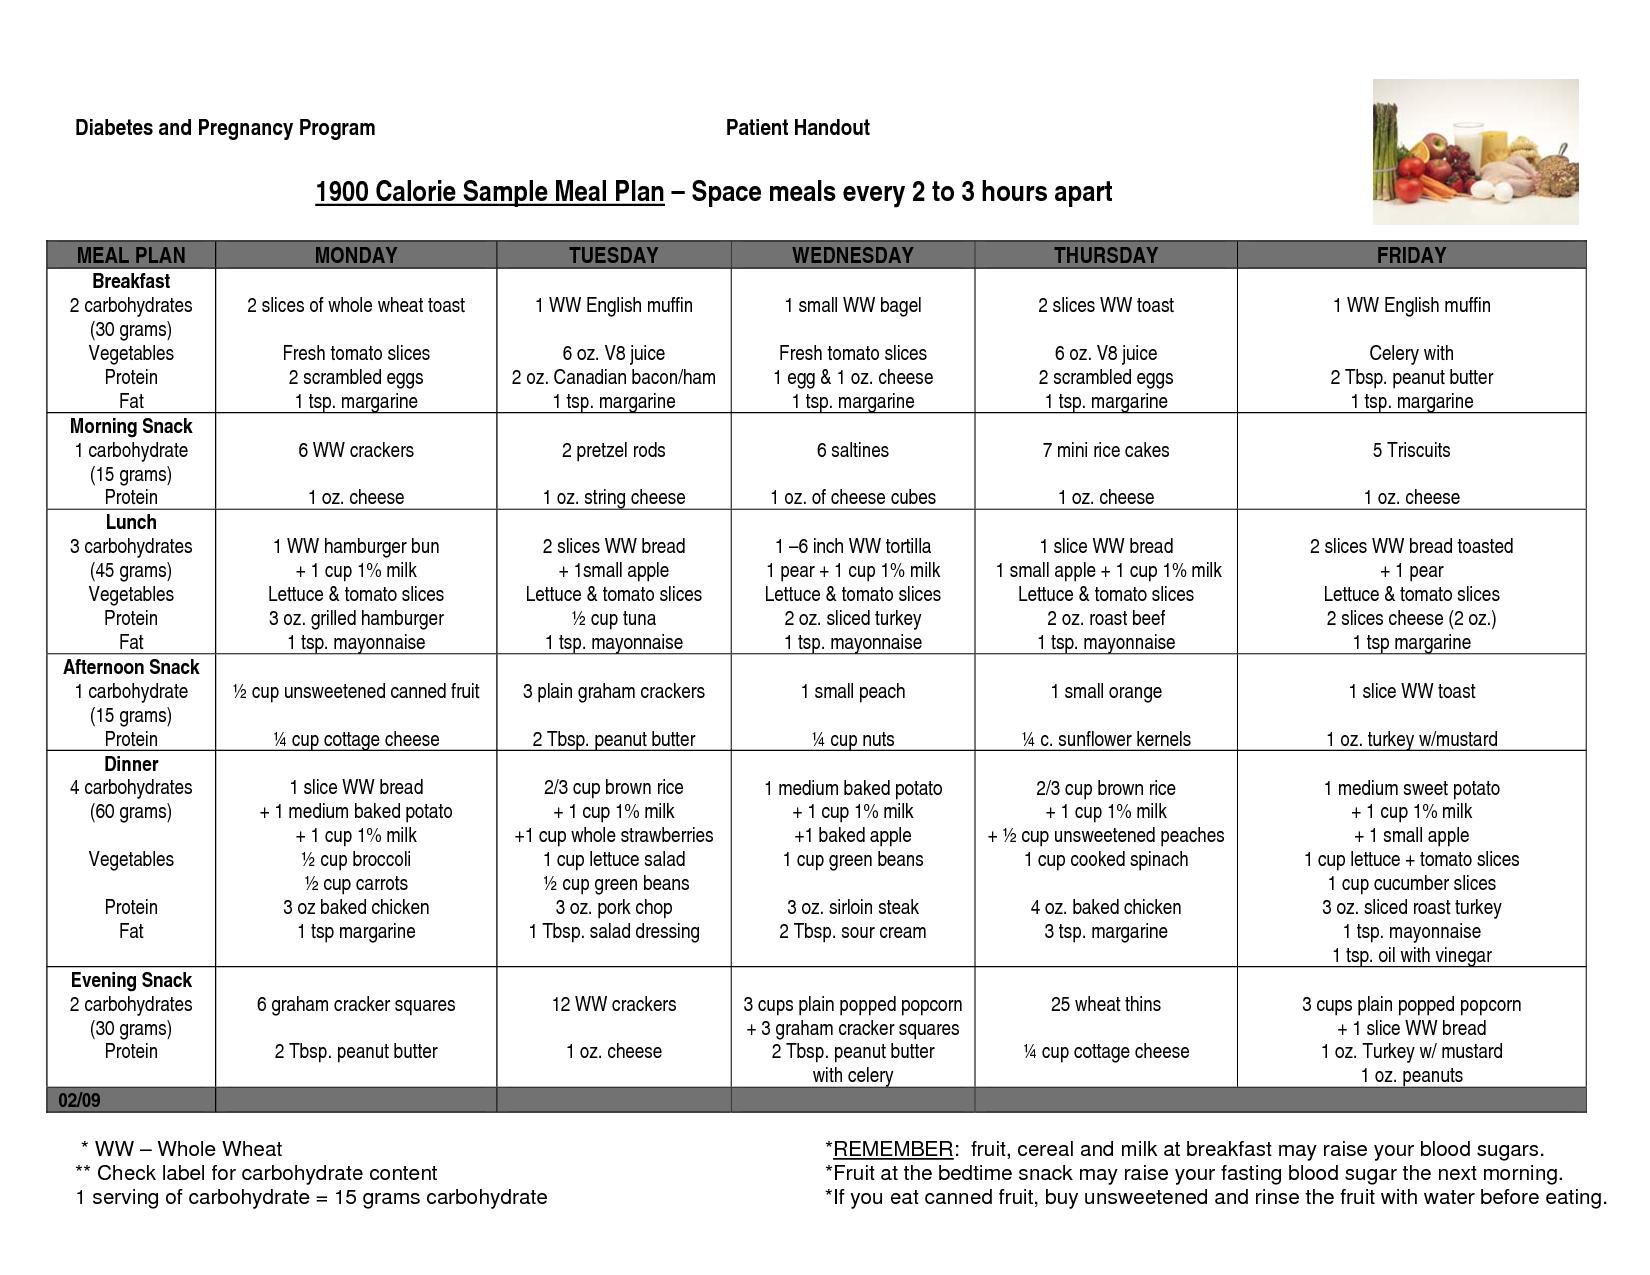 Gestational diabetes sample meal plan pdf parlo buenacocina co also diabetic daily menu sivandearest rh